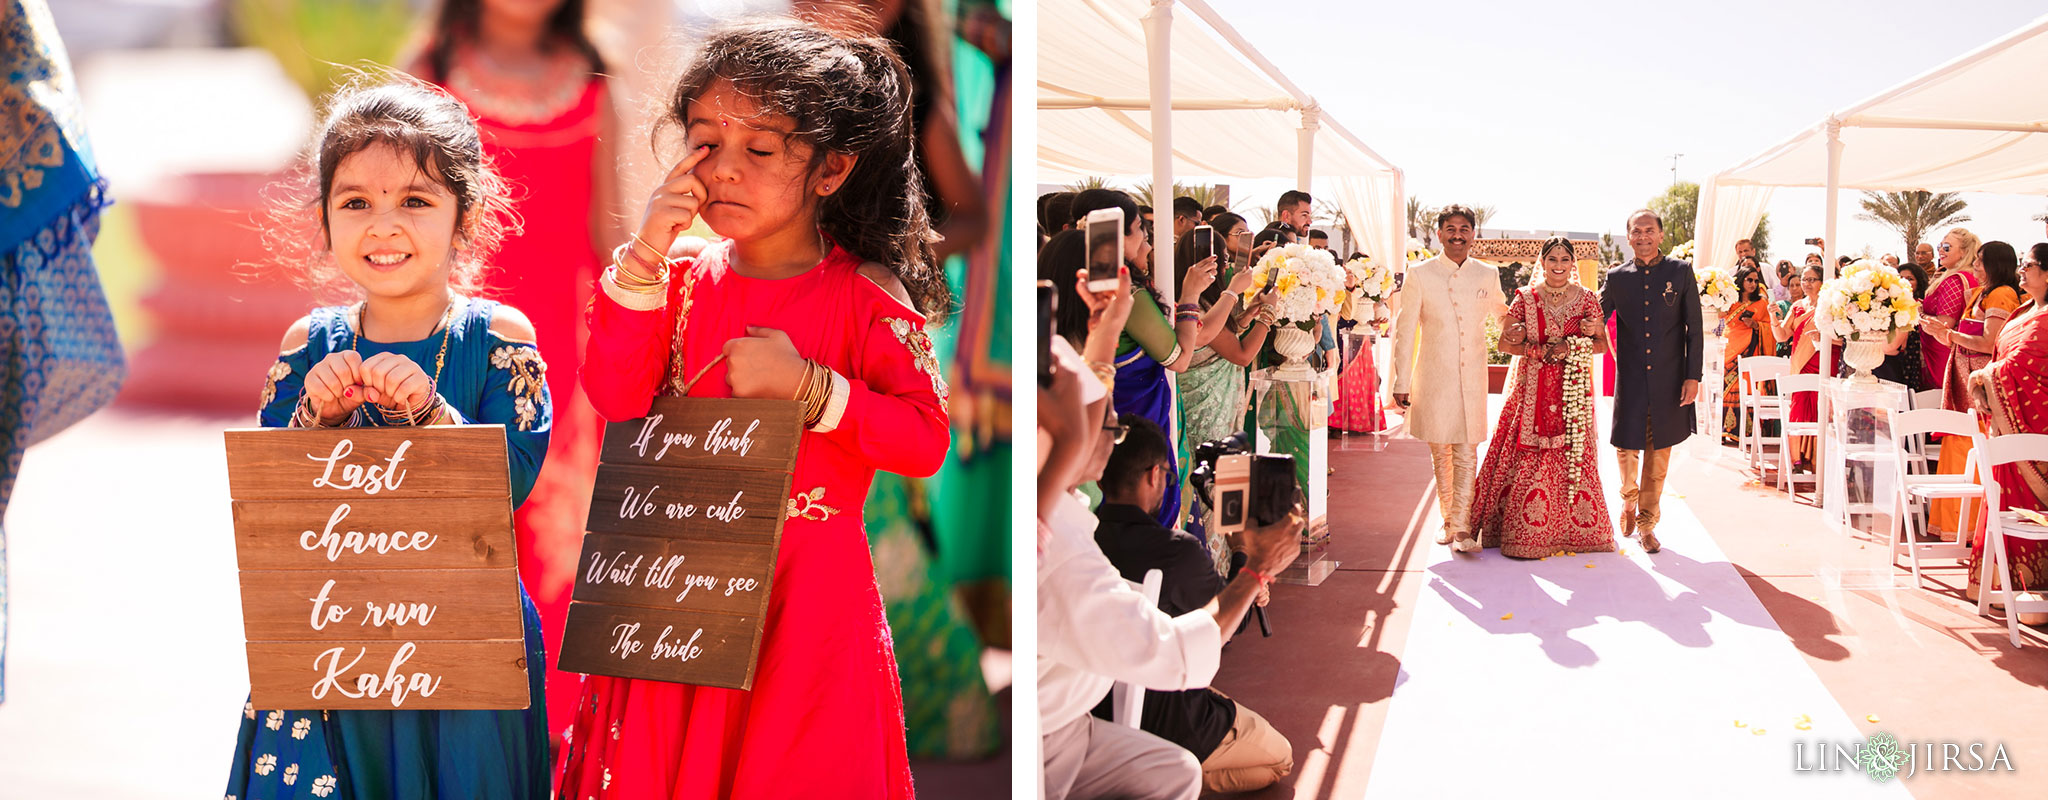 086 BAPS Swaminarayan Sanstha Chino Hills Indian Wedding Photography